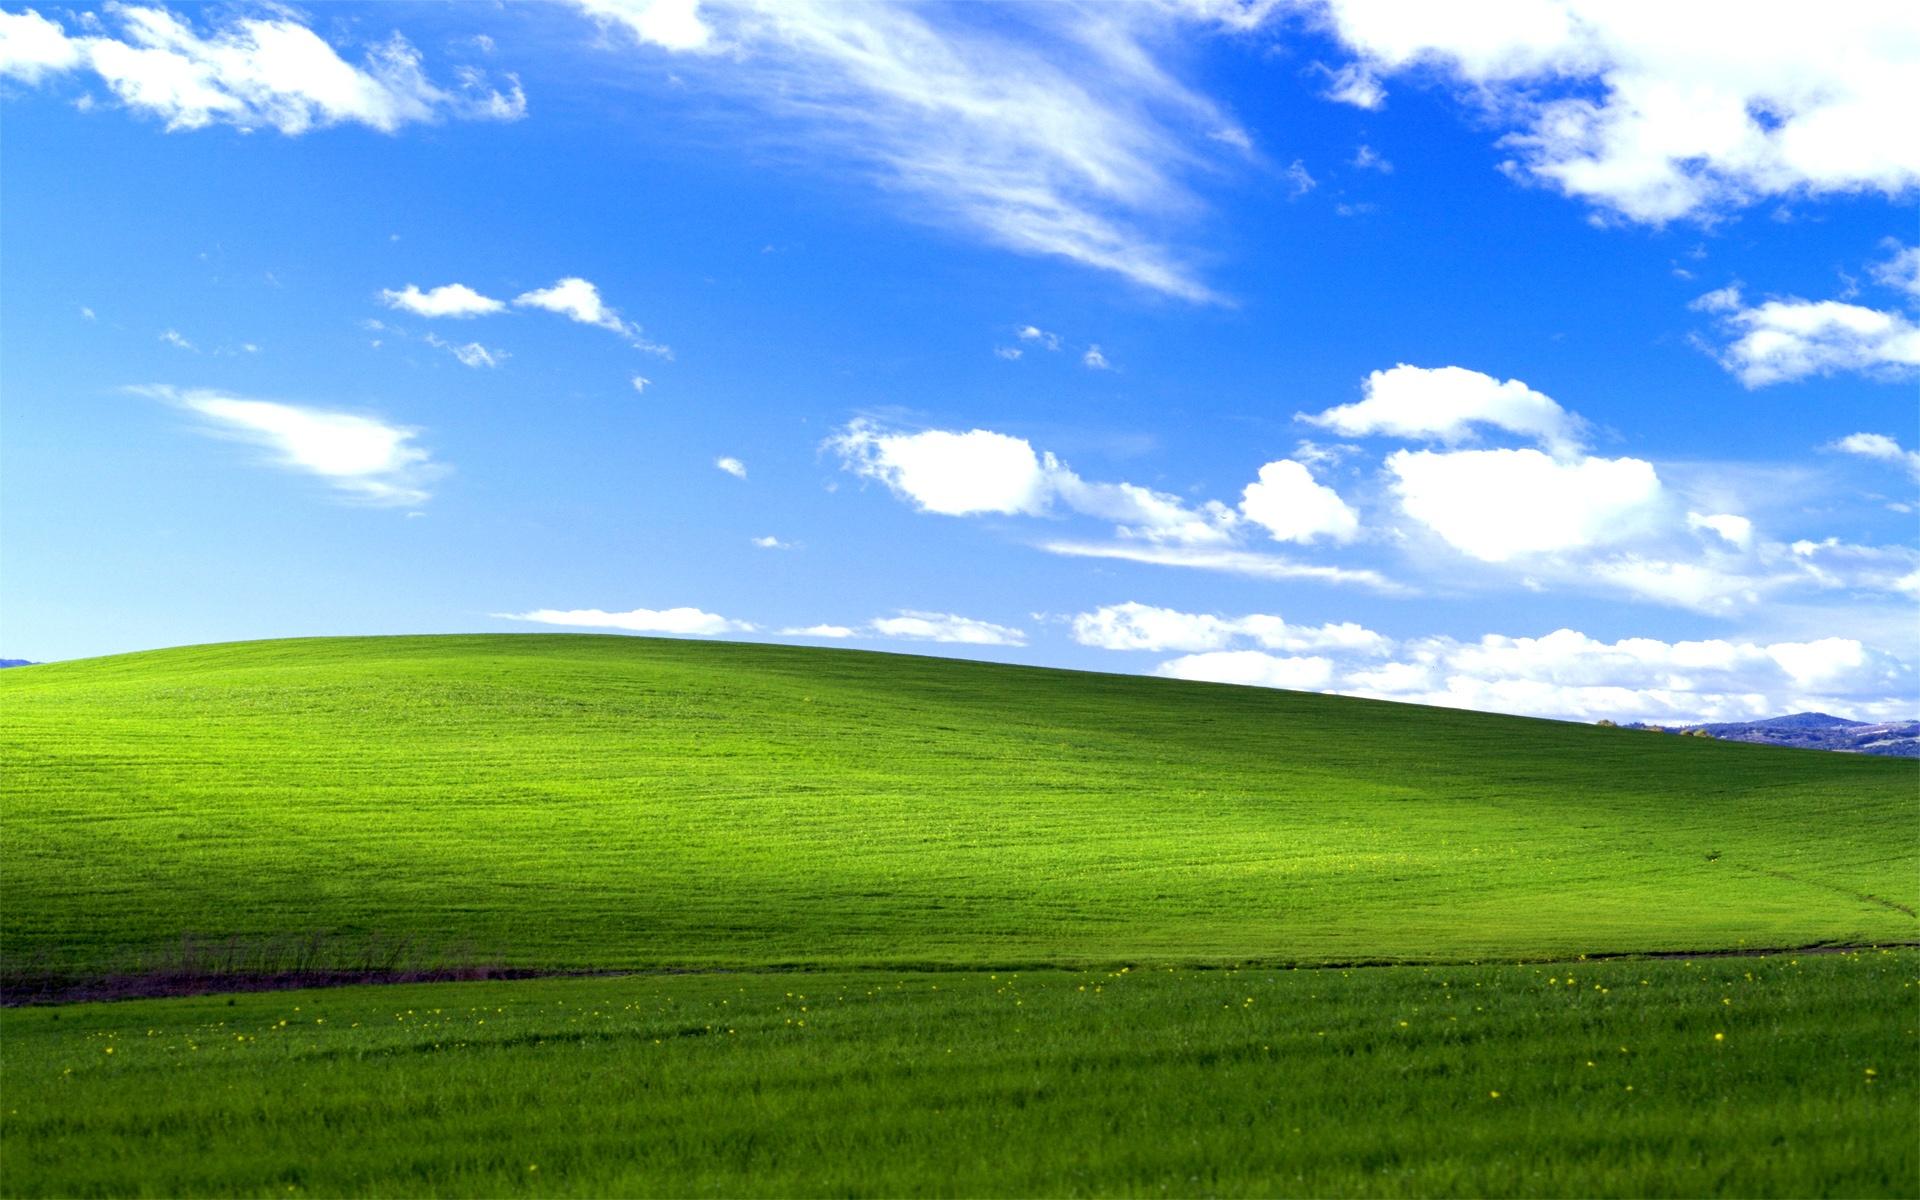 Widescreen resolutions 1280 x 800 1440 x 900 1680 x 1050 1920 x 1200 1920x1200